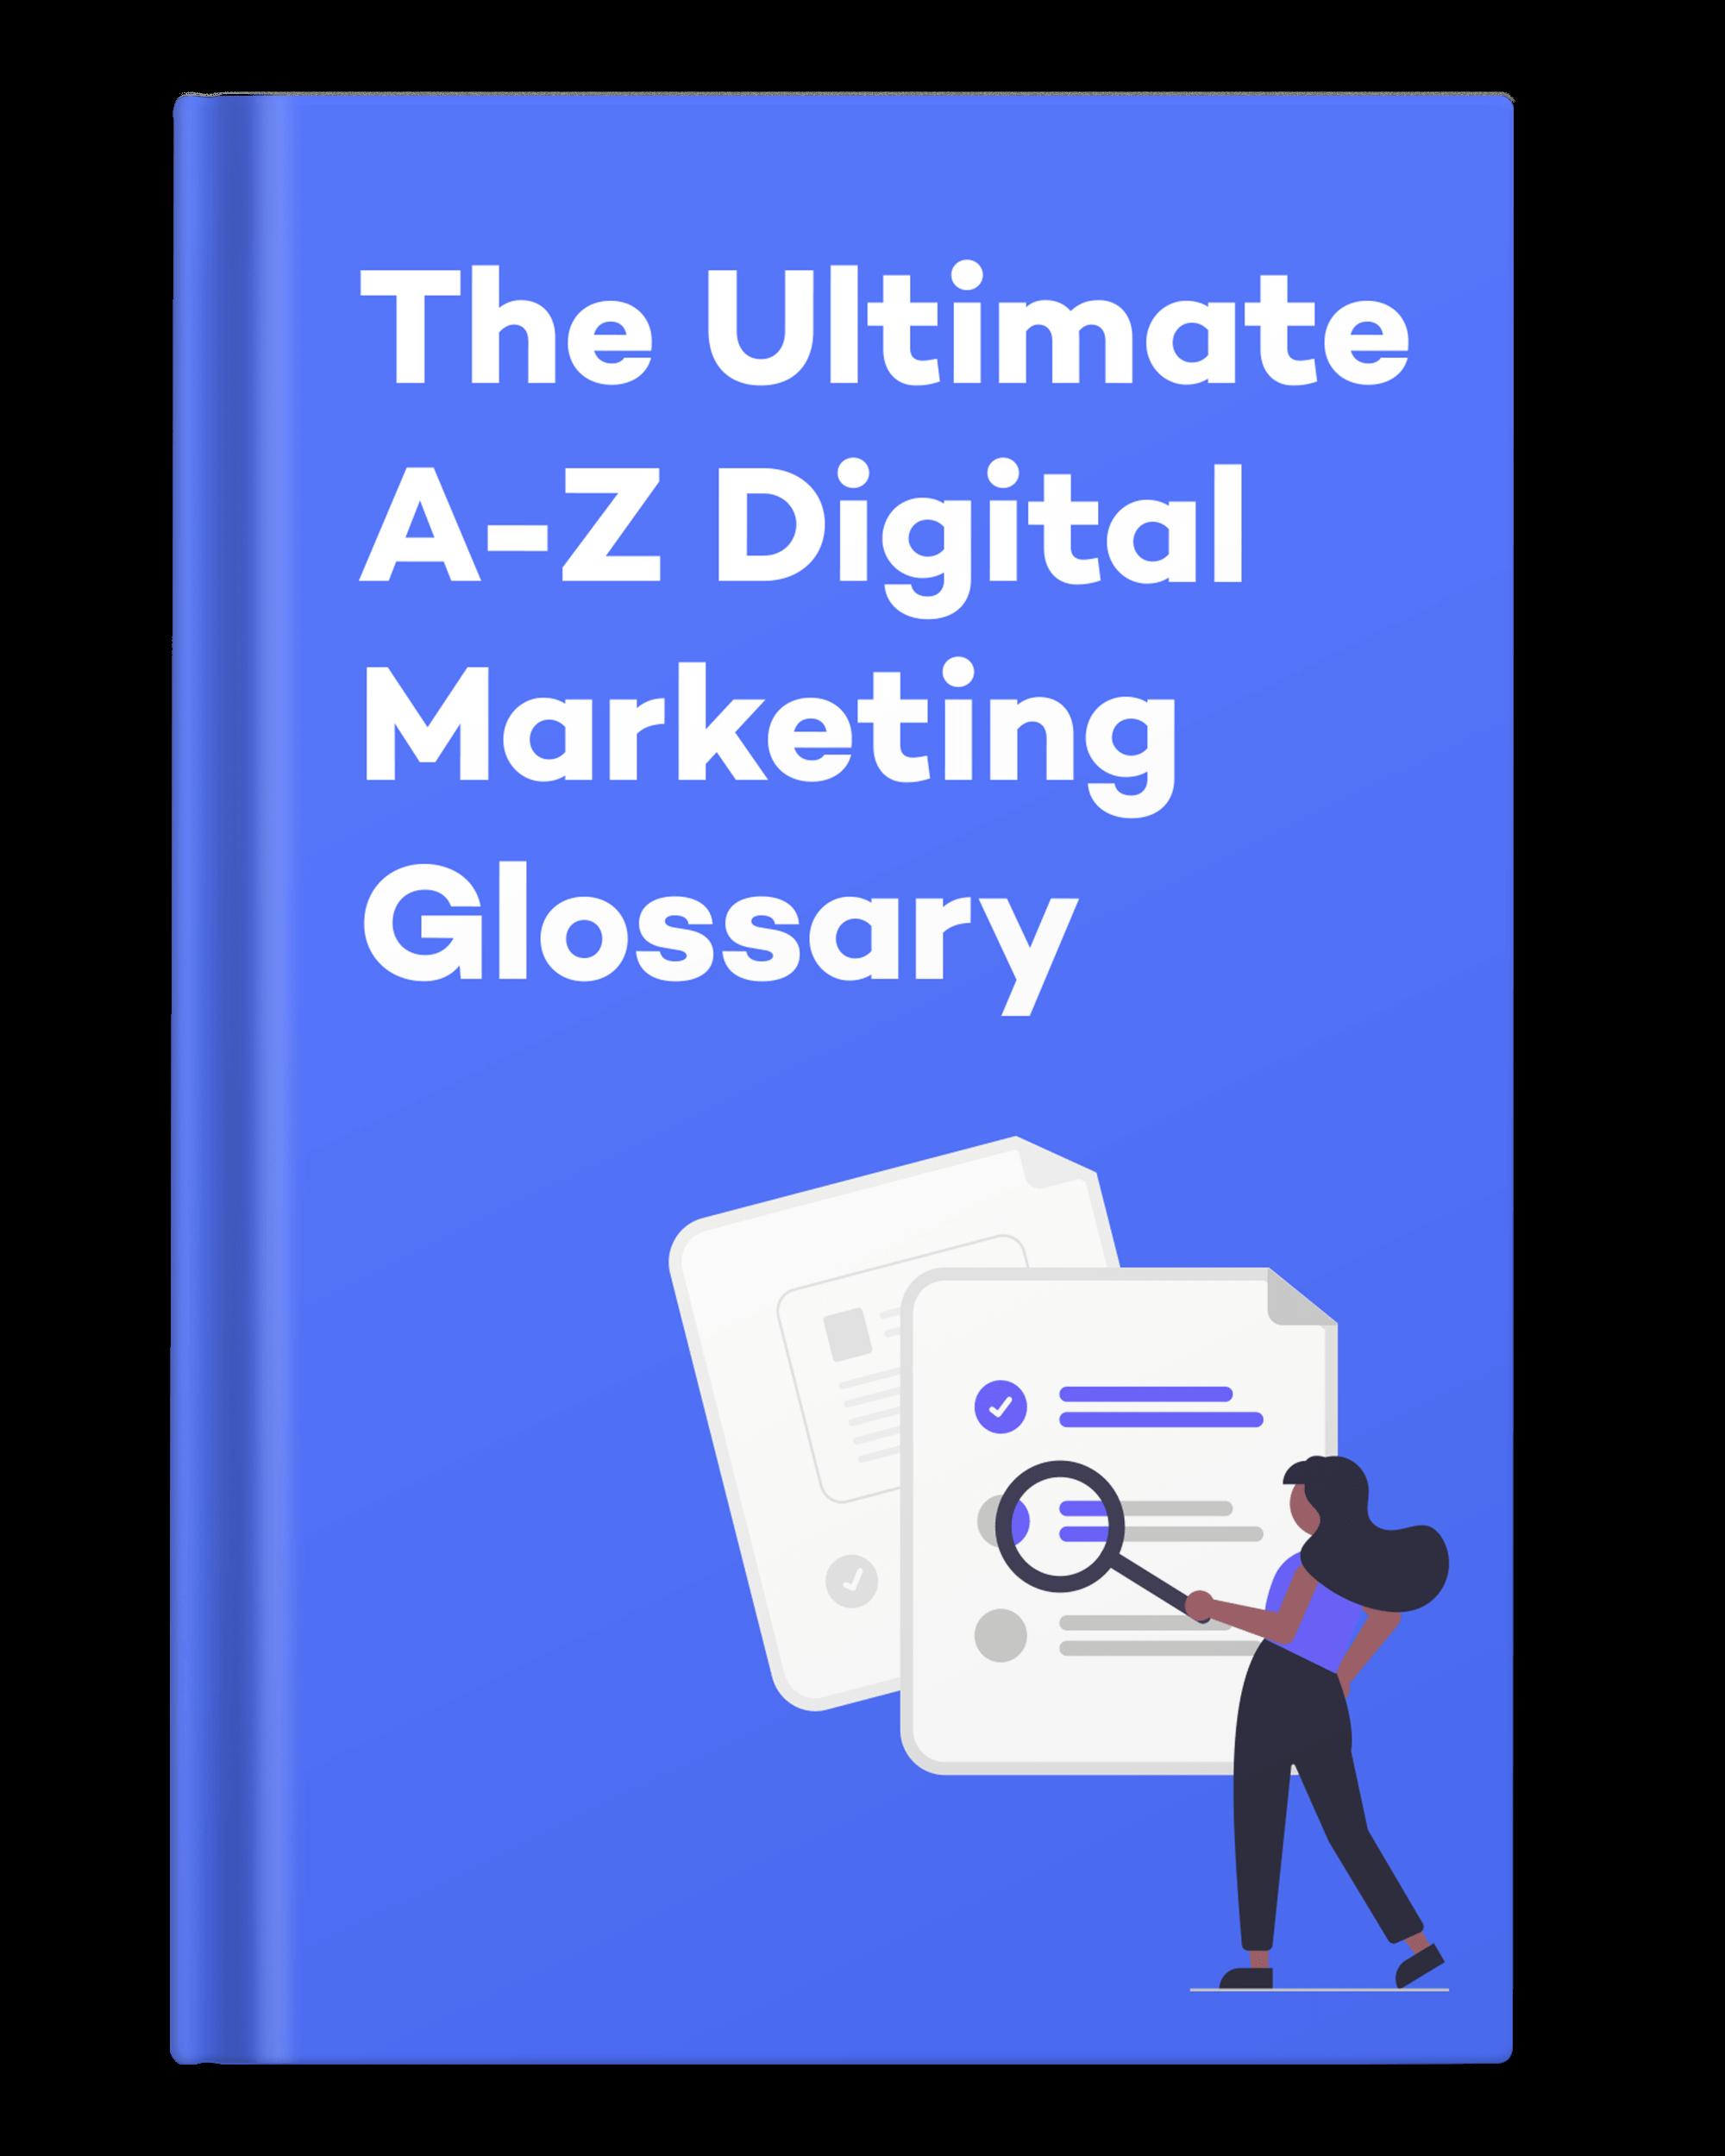 The Ultimate Digital Marketing Dictionary eBook